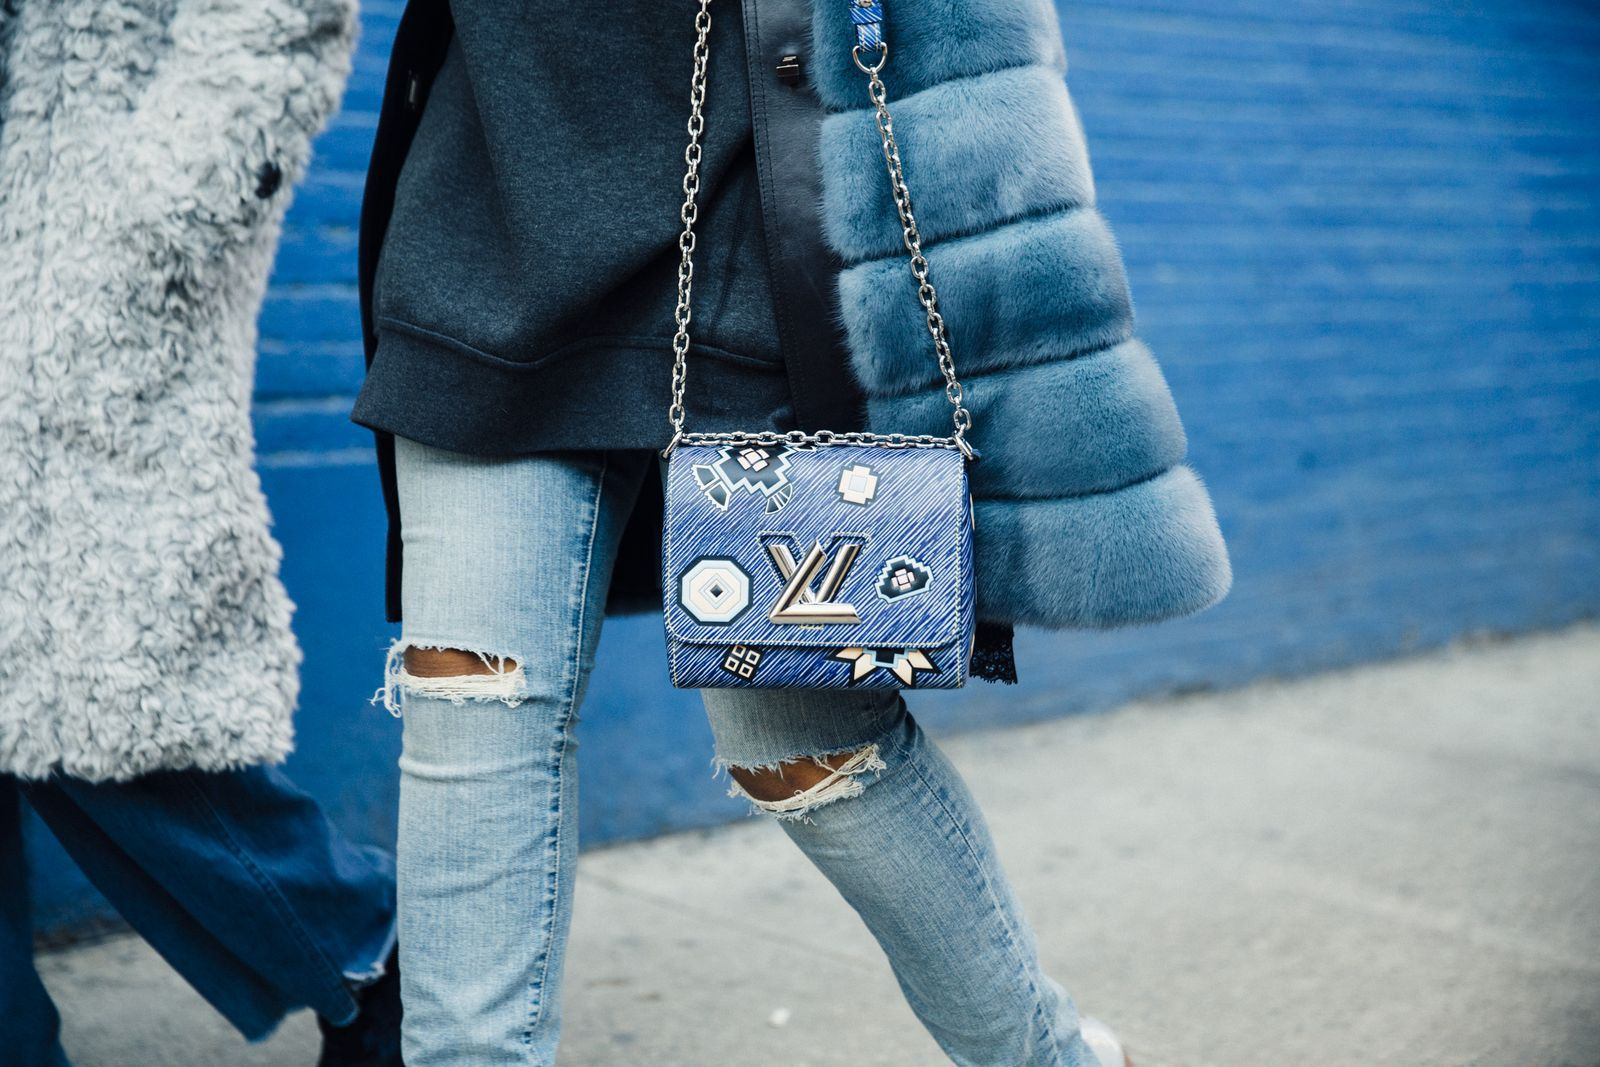 hermes constance bag sizes - What Designer Bag Has the Best Resale Value? - Racked